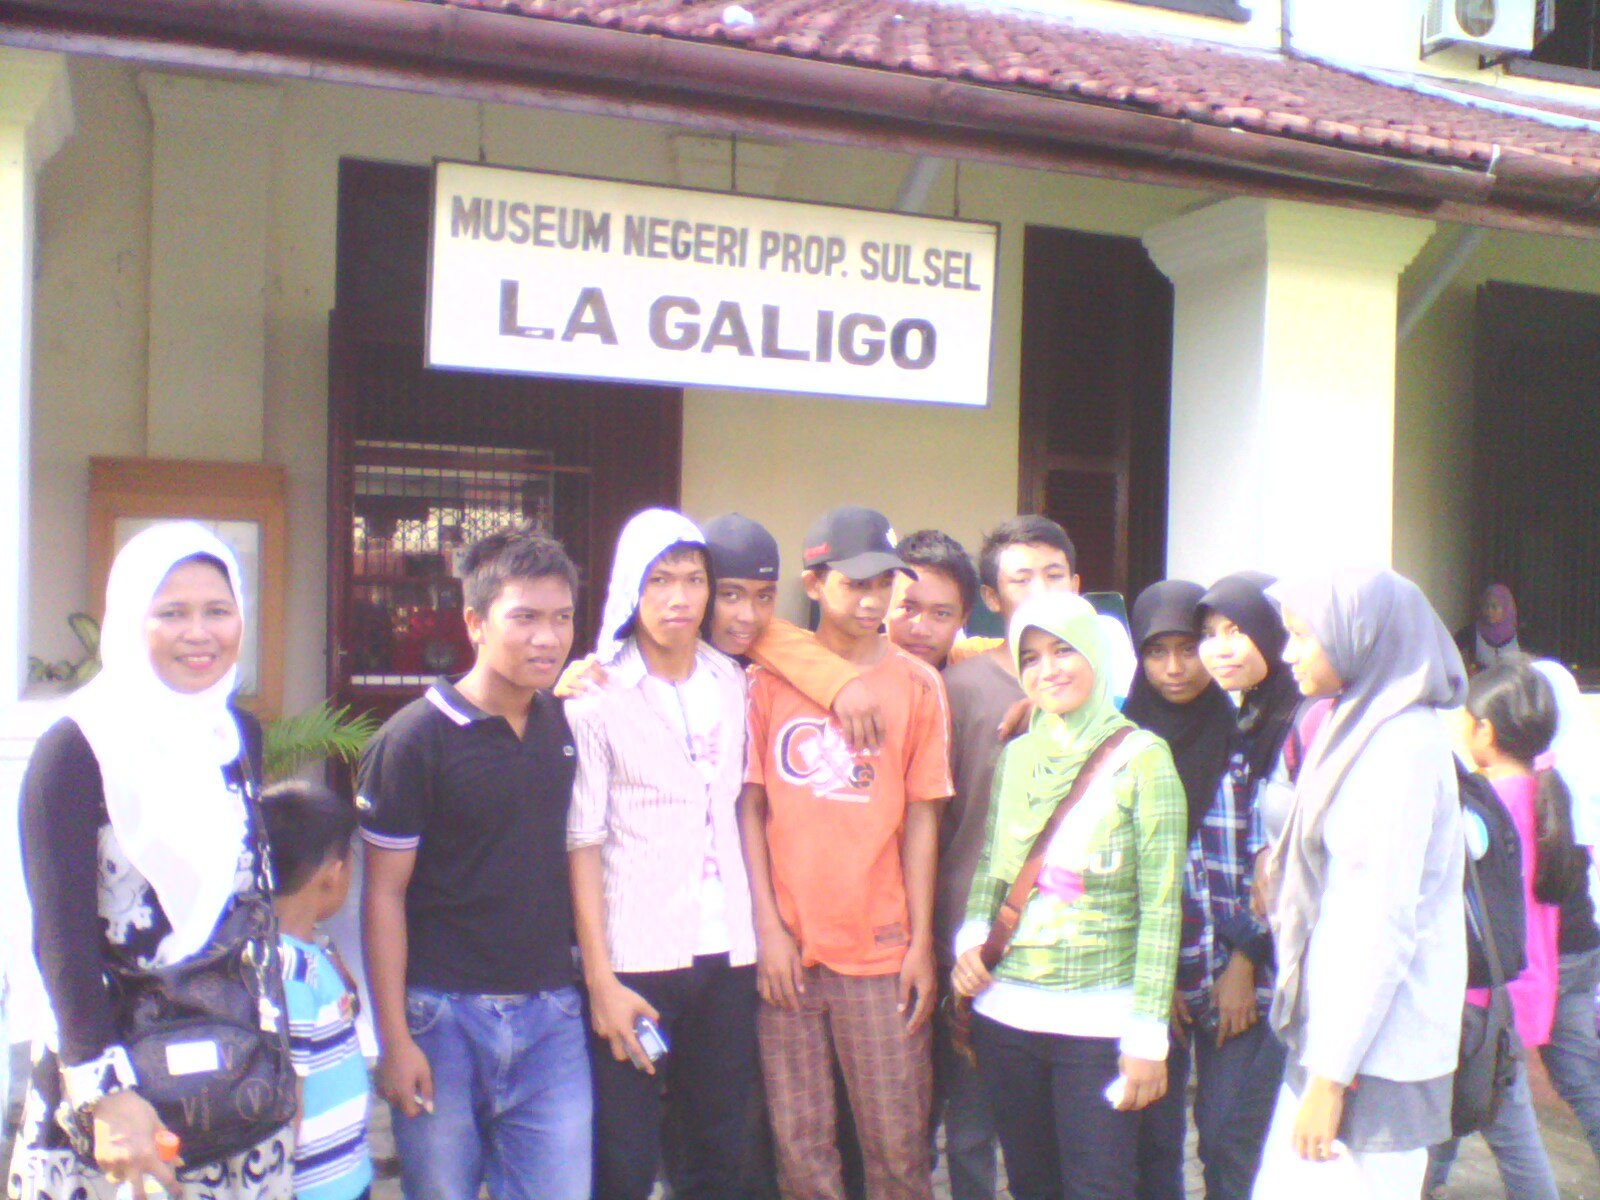 Wisata Ilmiah Man2 Pare Makassar Man2pare Depan Museum Lagaligo La